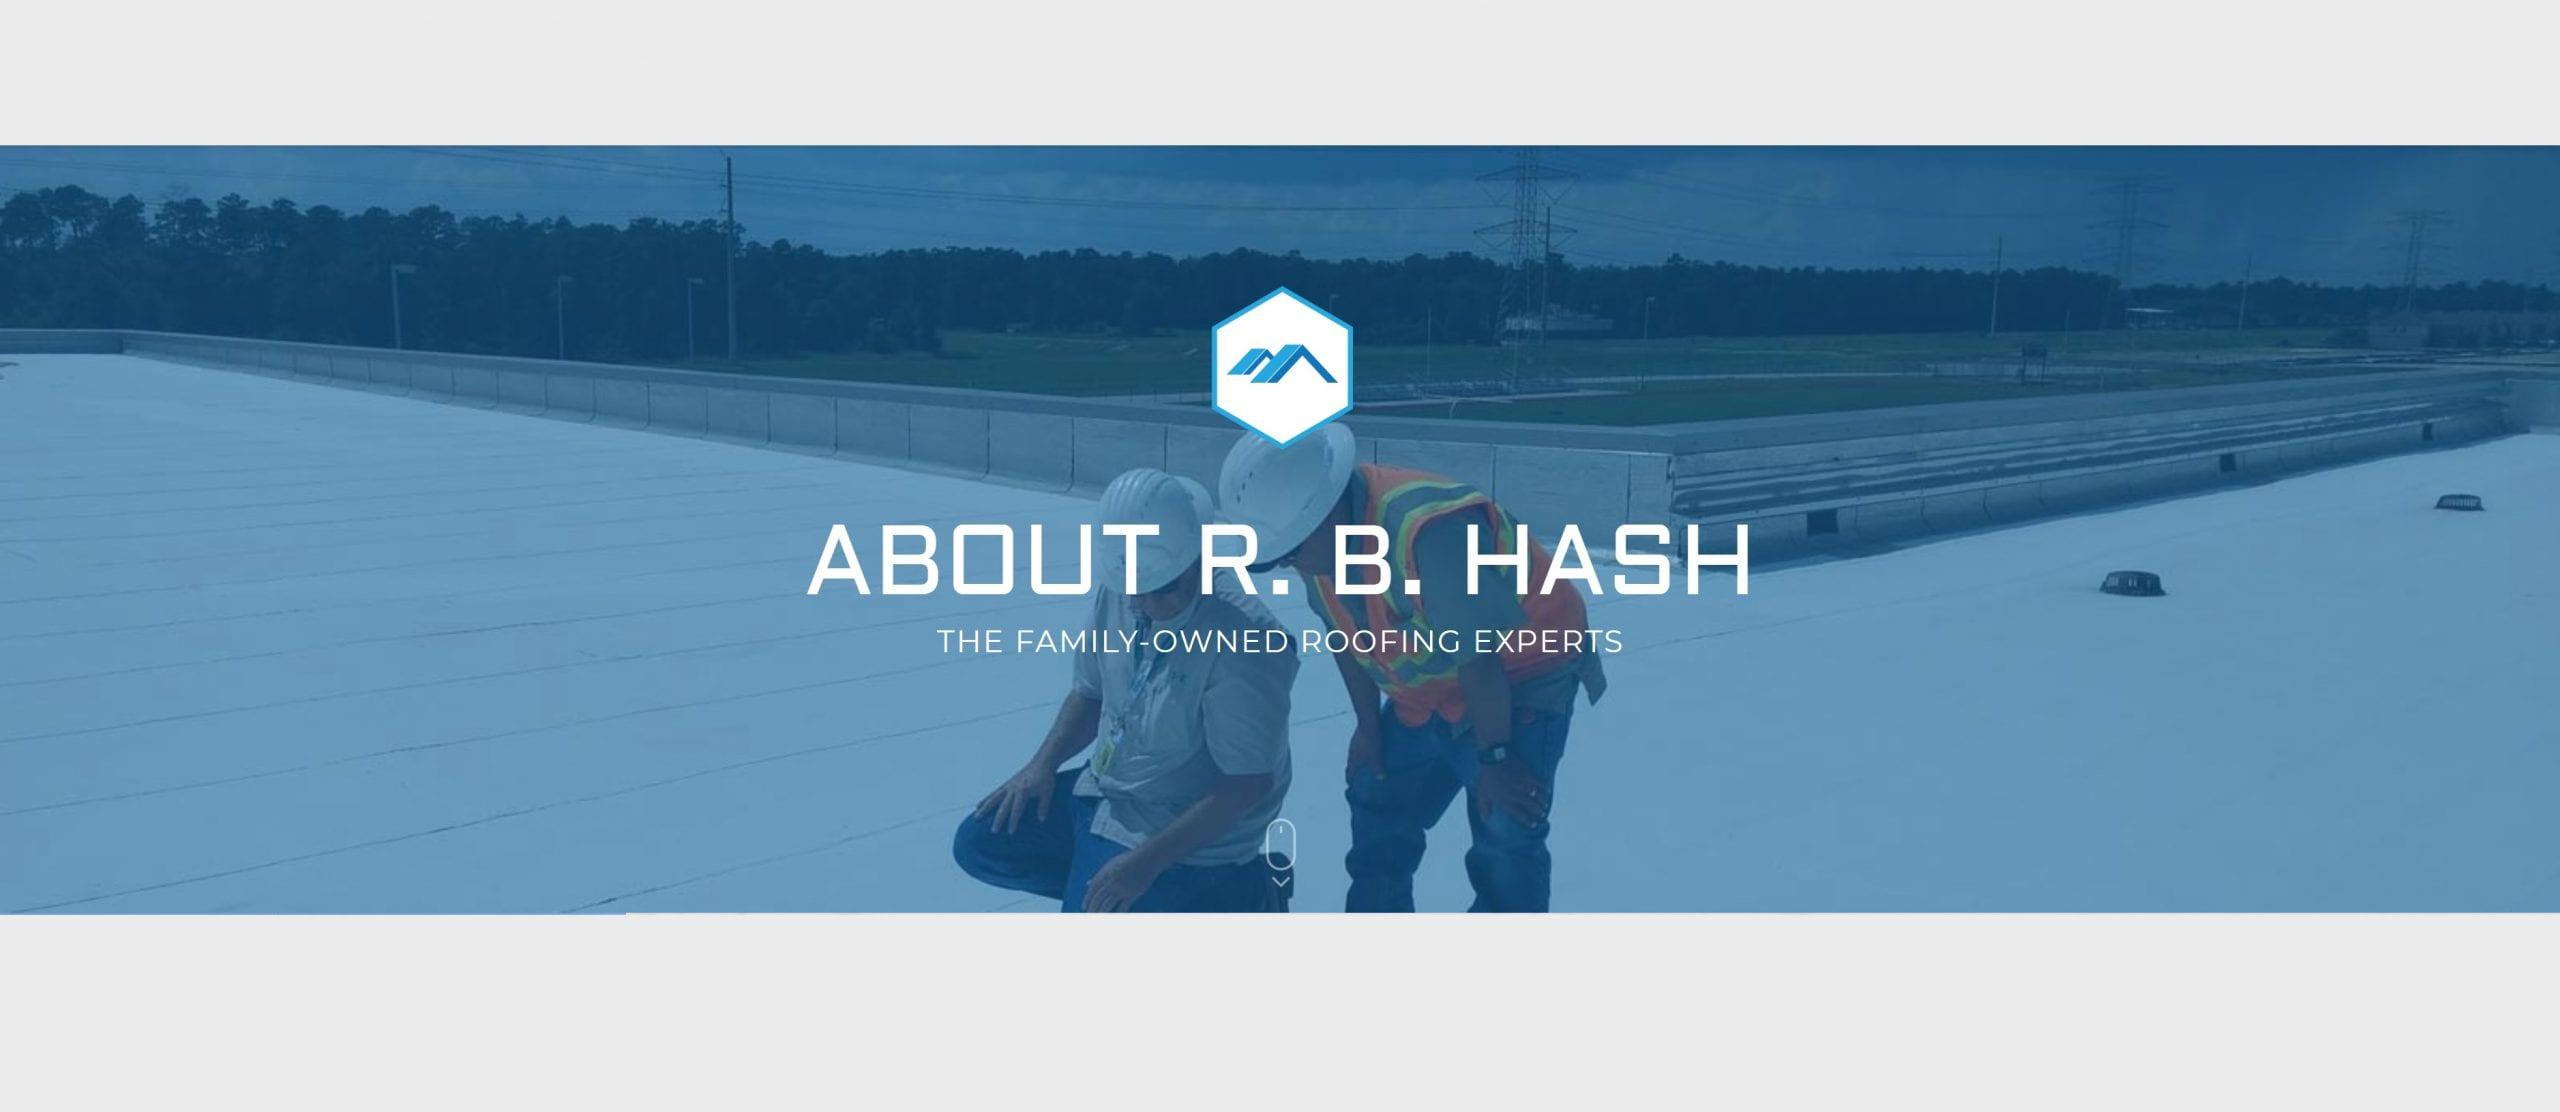 R.B. Hash & Associates